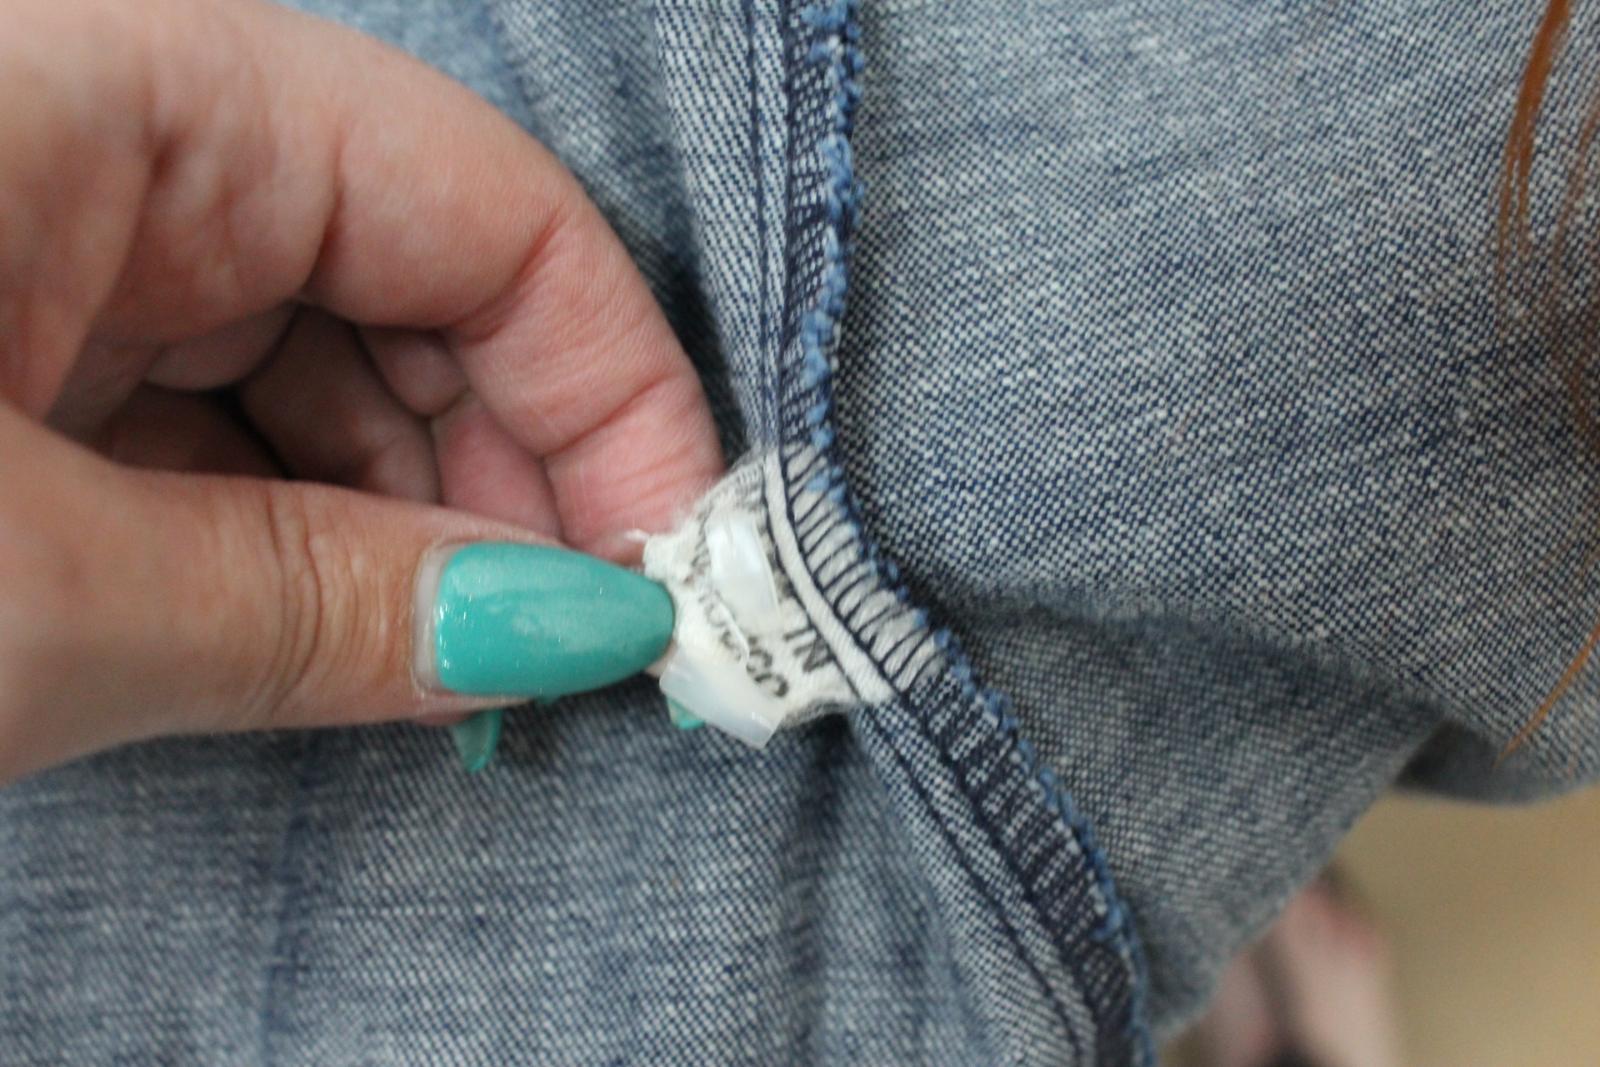 Lee-Jeans-de-hombre-Vintage-Denim-Azul-Algodon-con-Corchetes-Cierre-Mangas-Largas-Camisa-S miniatura 9